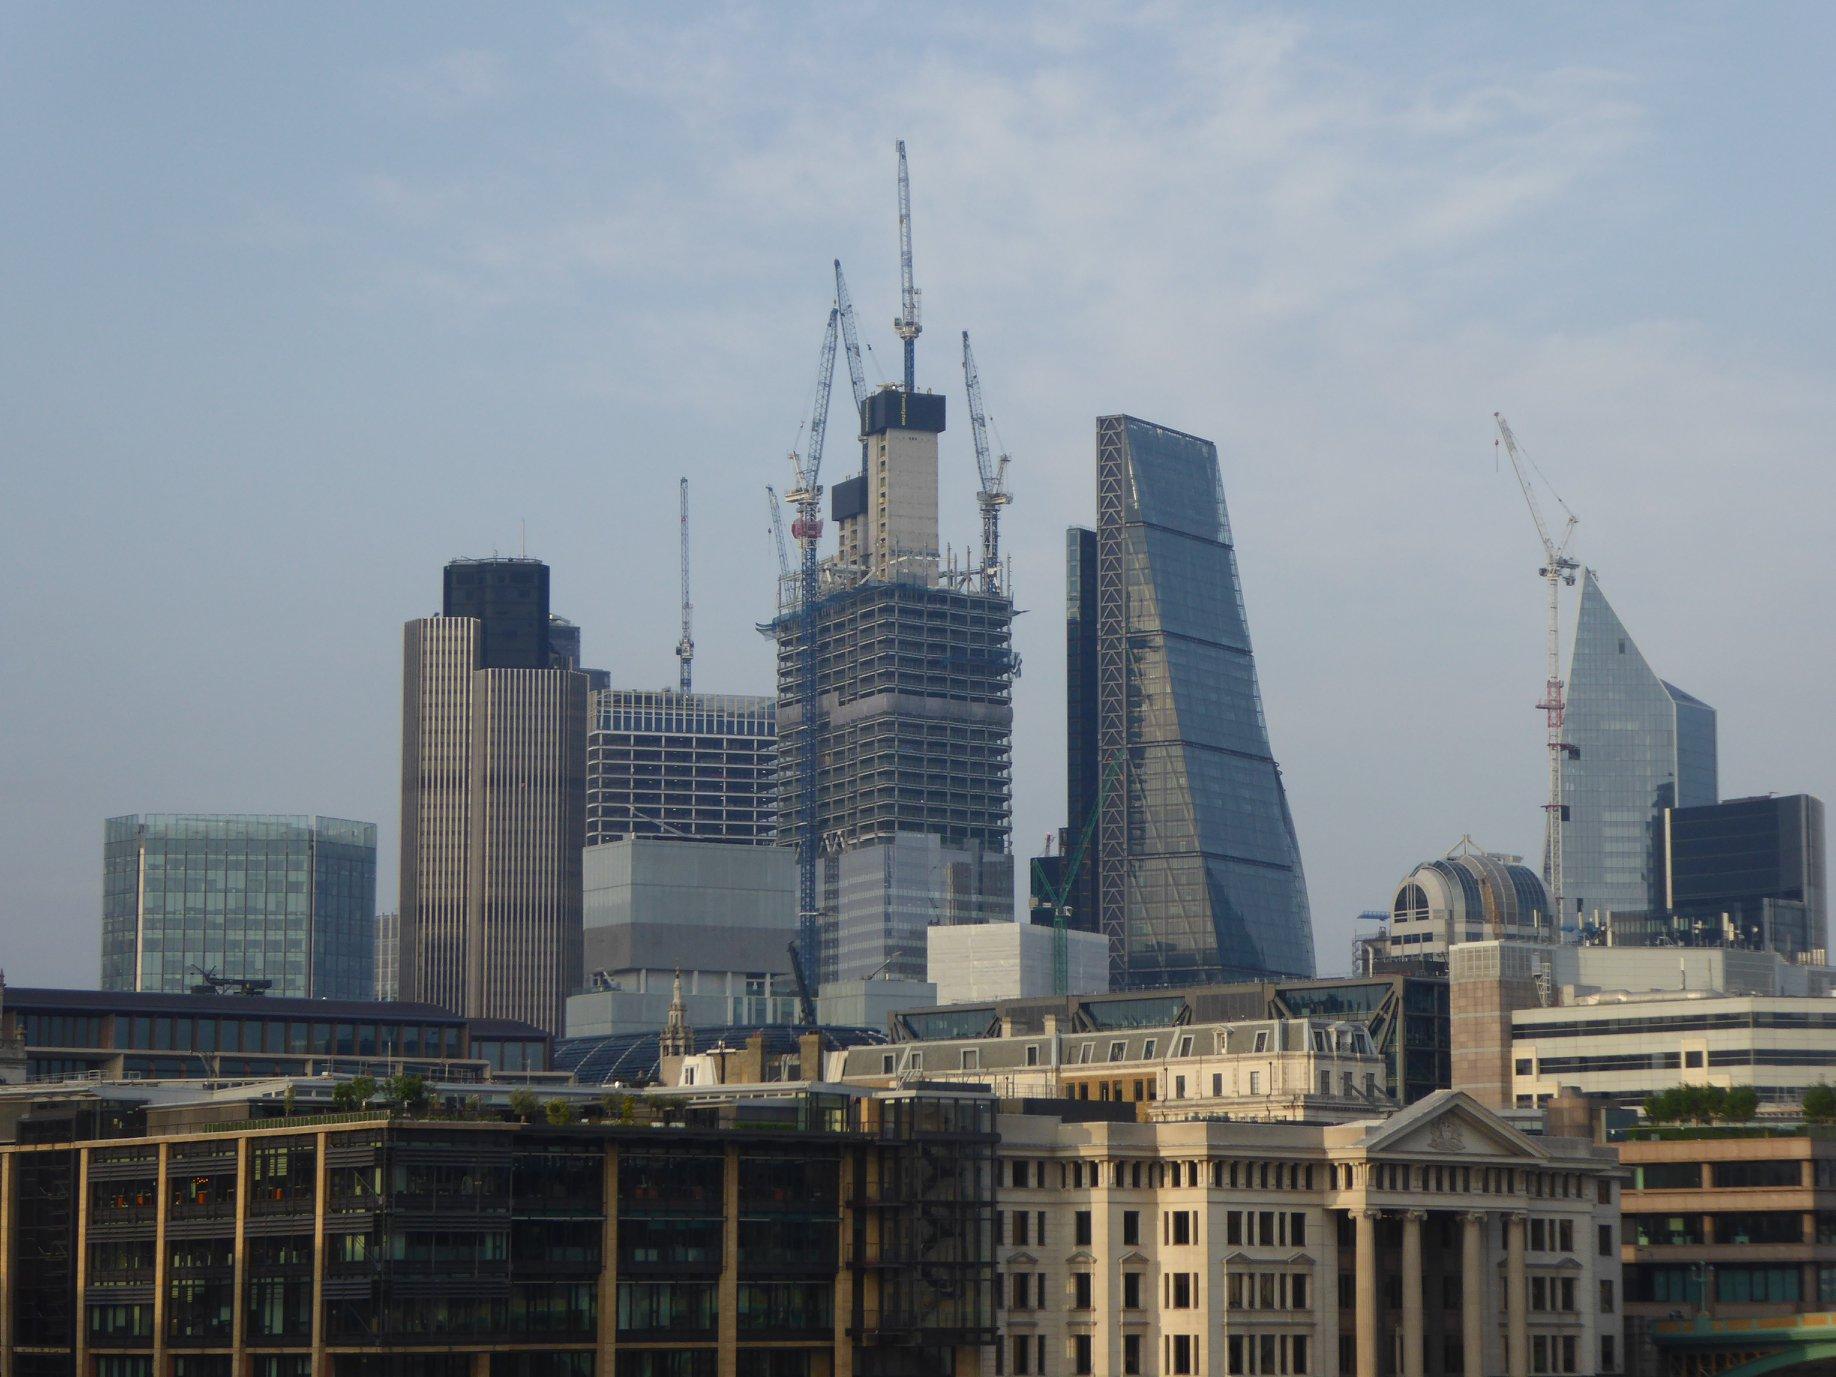 City of London, Copyright P.A.Goodall